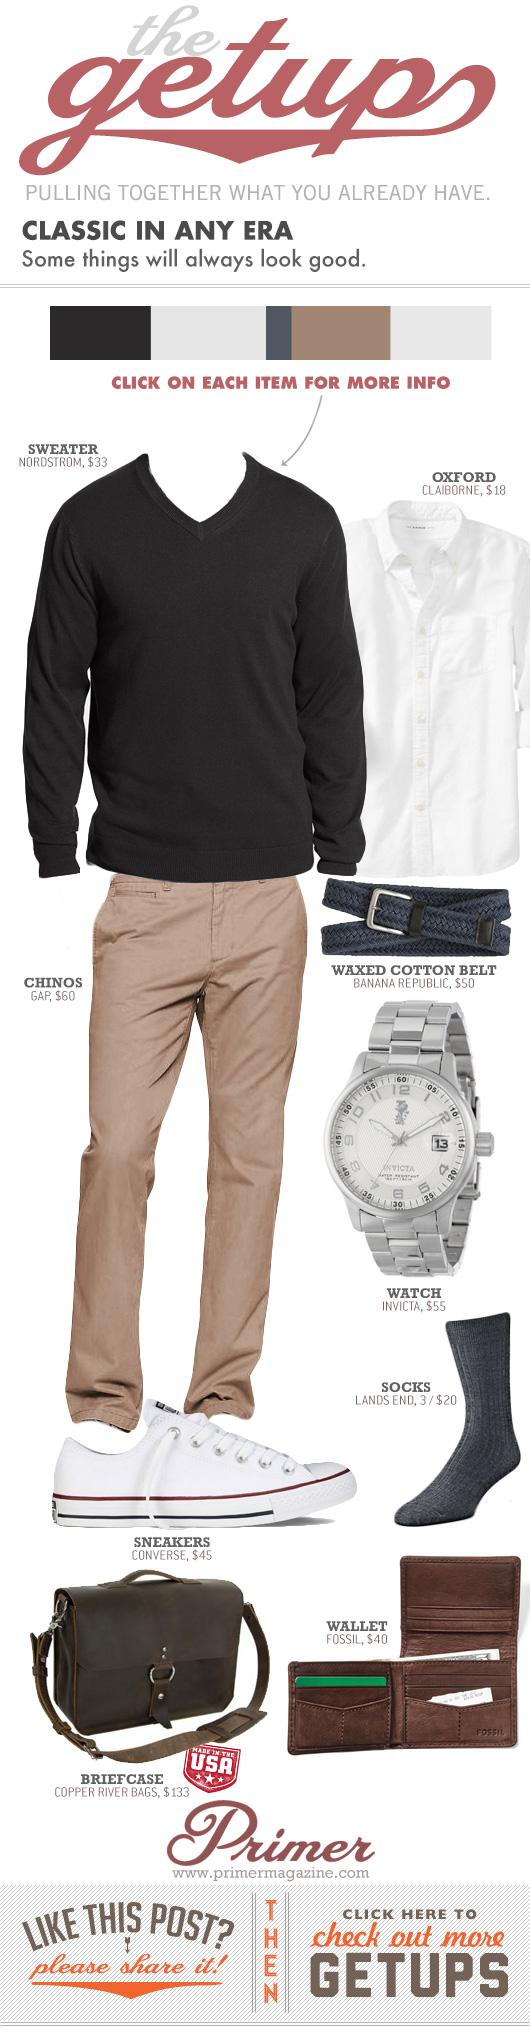 Getup Classic in Any Era - black sweater, white shirt, khakis